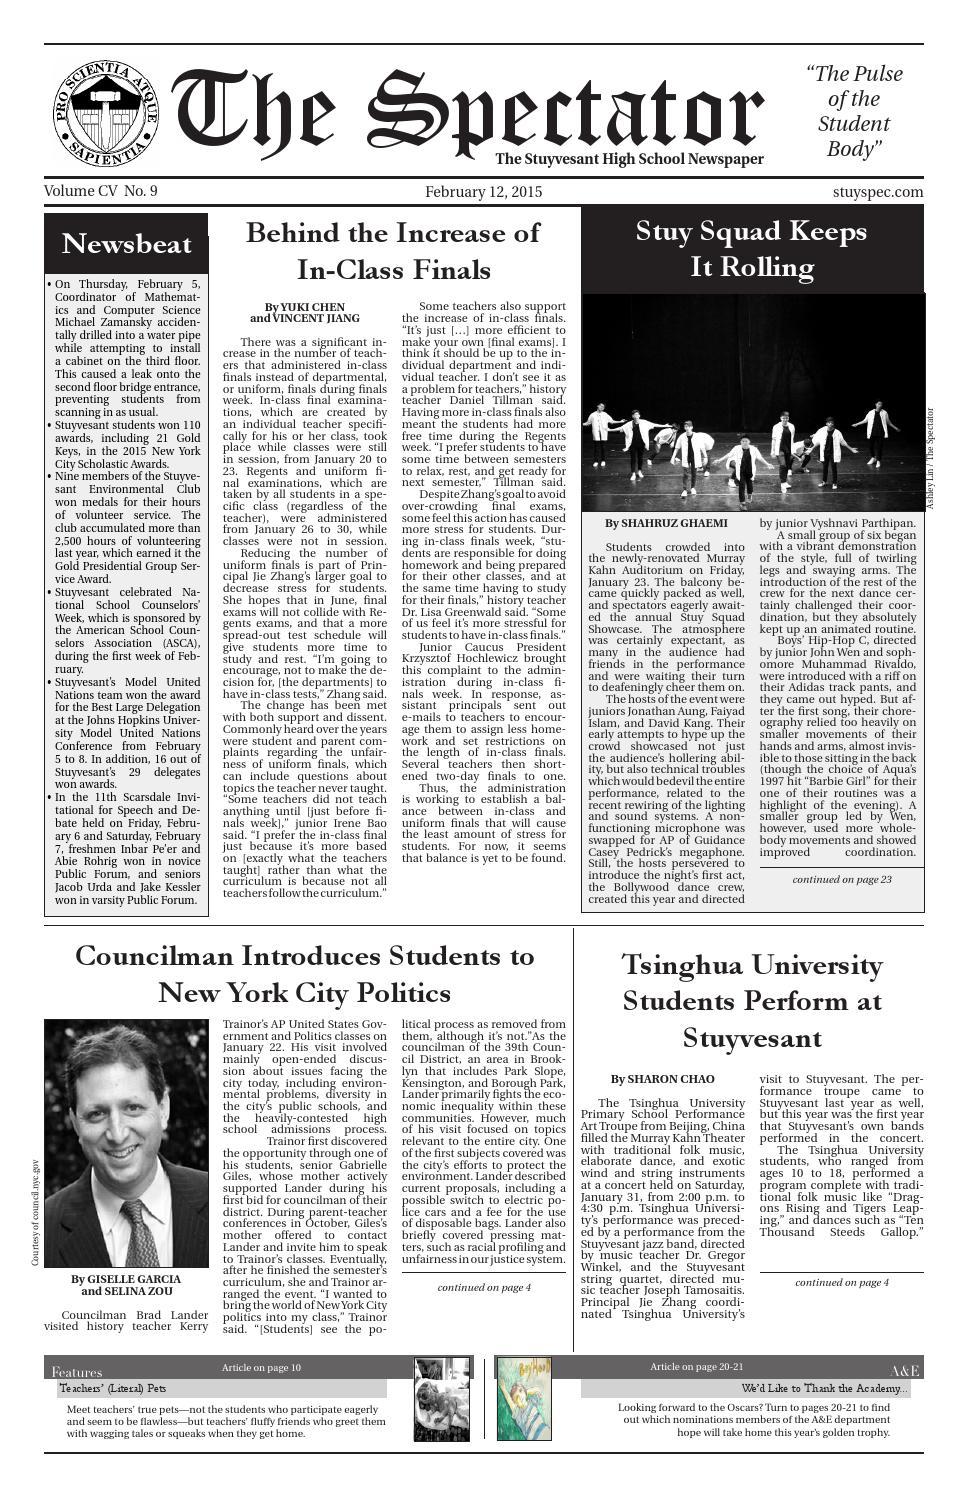 Volume 105, Issue 9 by The Stuyvesant Spectator issuu